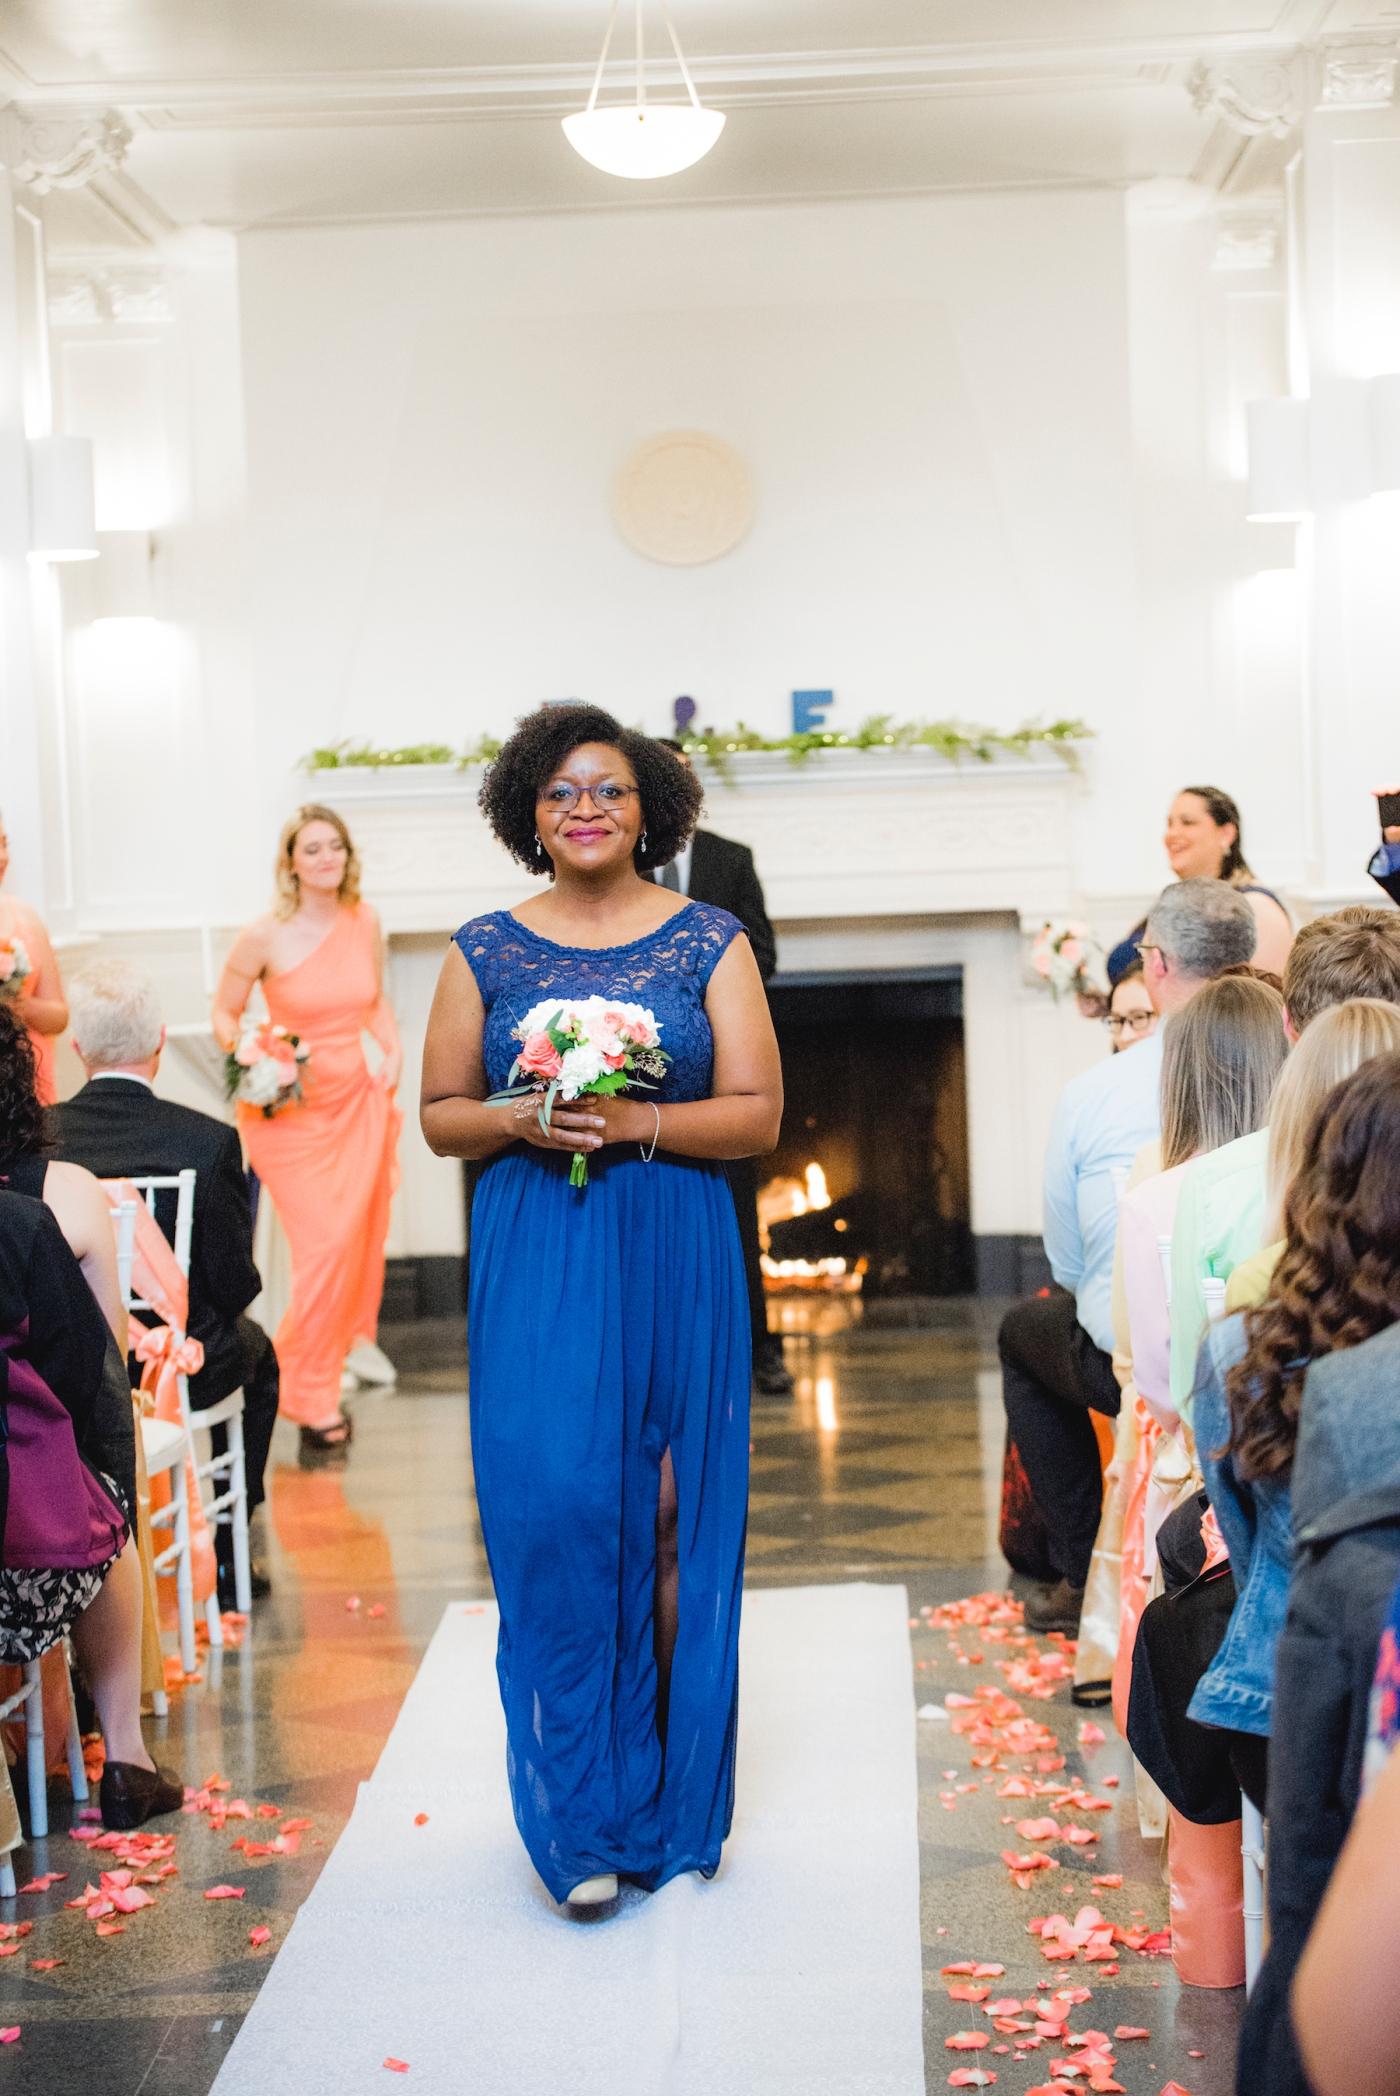 DSC_2755Everett_Wedding_Ballroom_Jane_Speleers_photography_Rachel_and_Edmund_Ceremony_2017